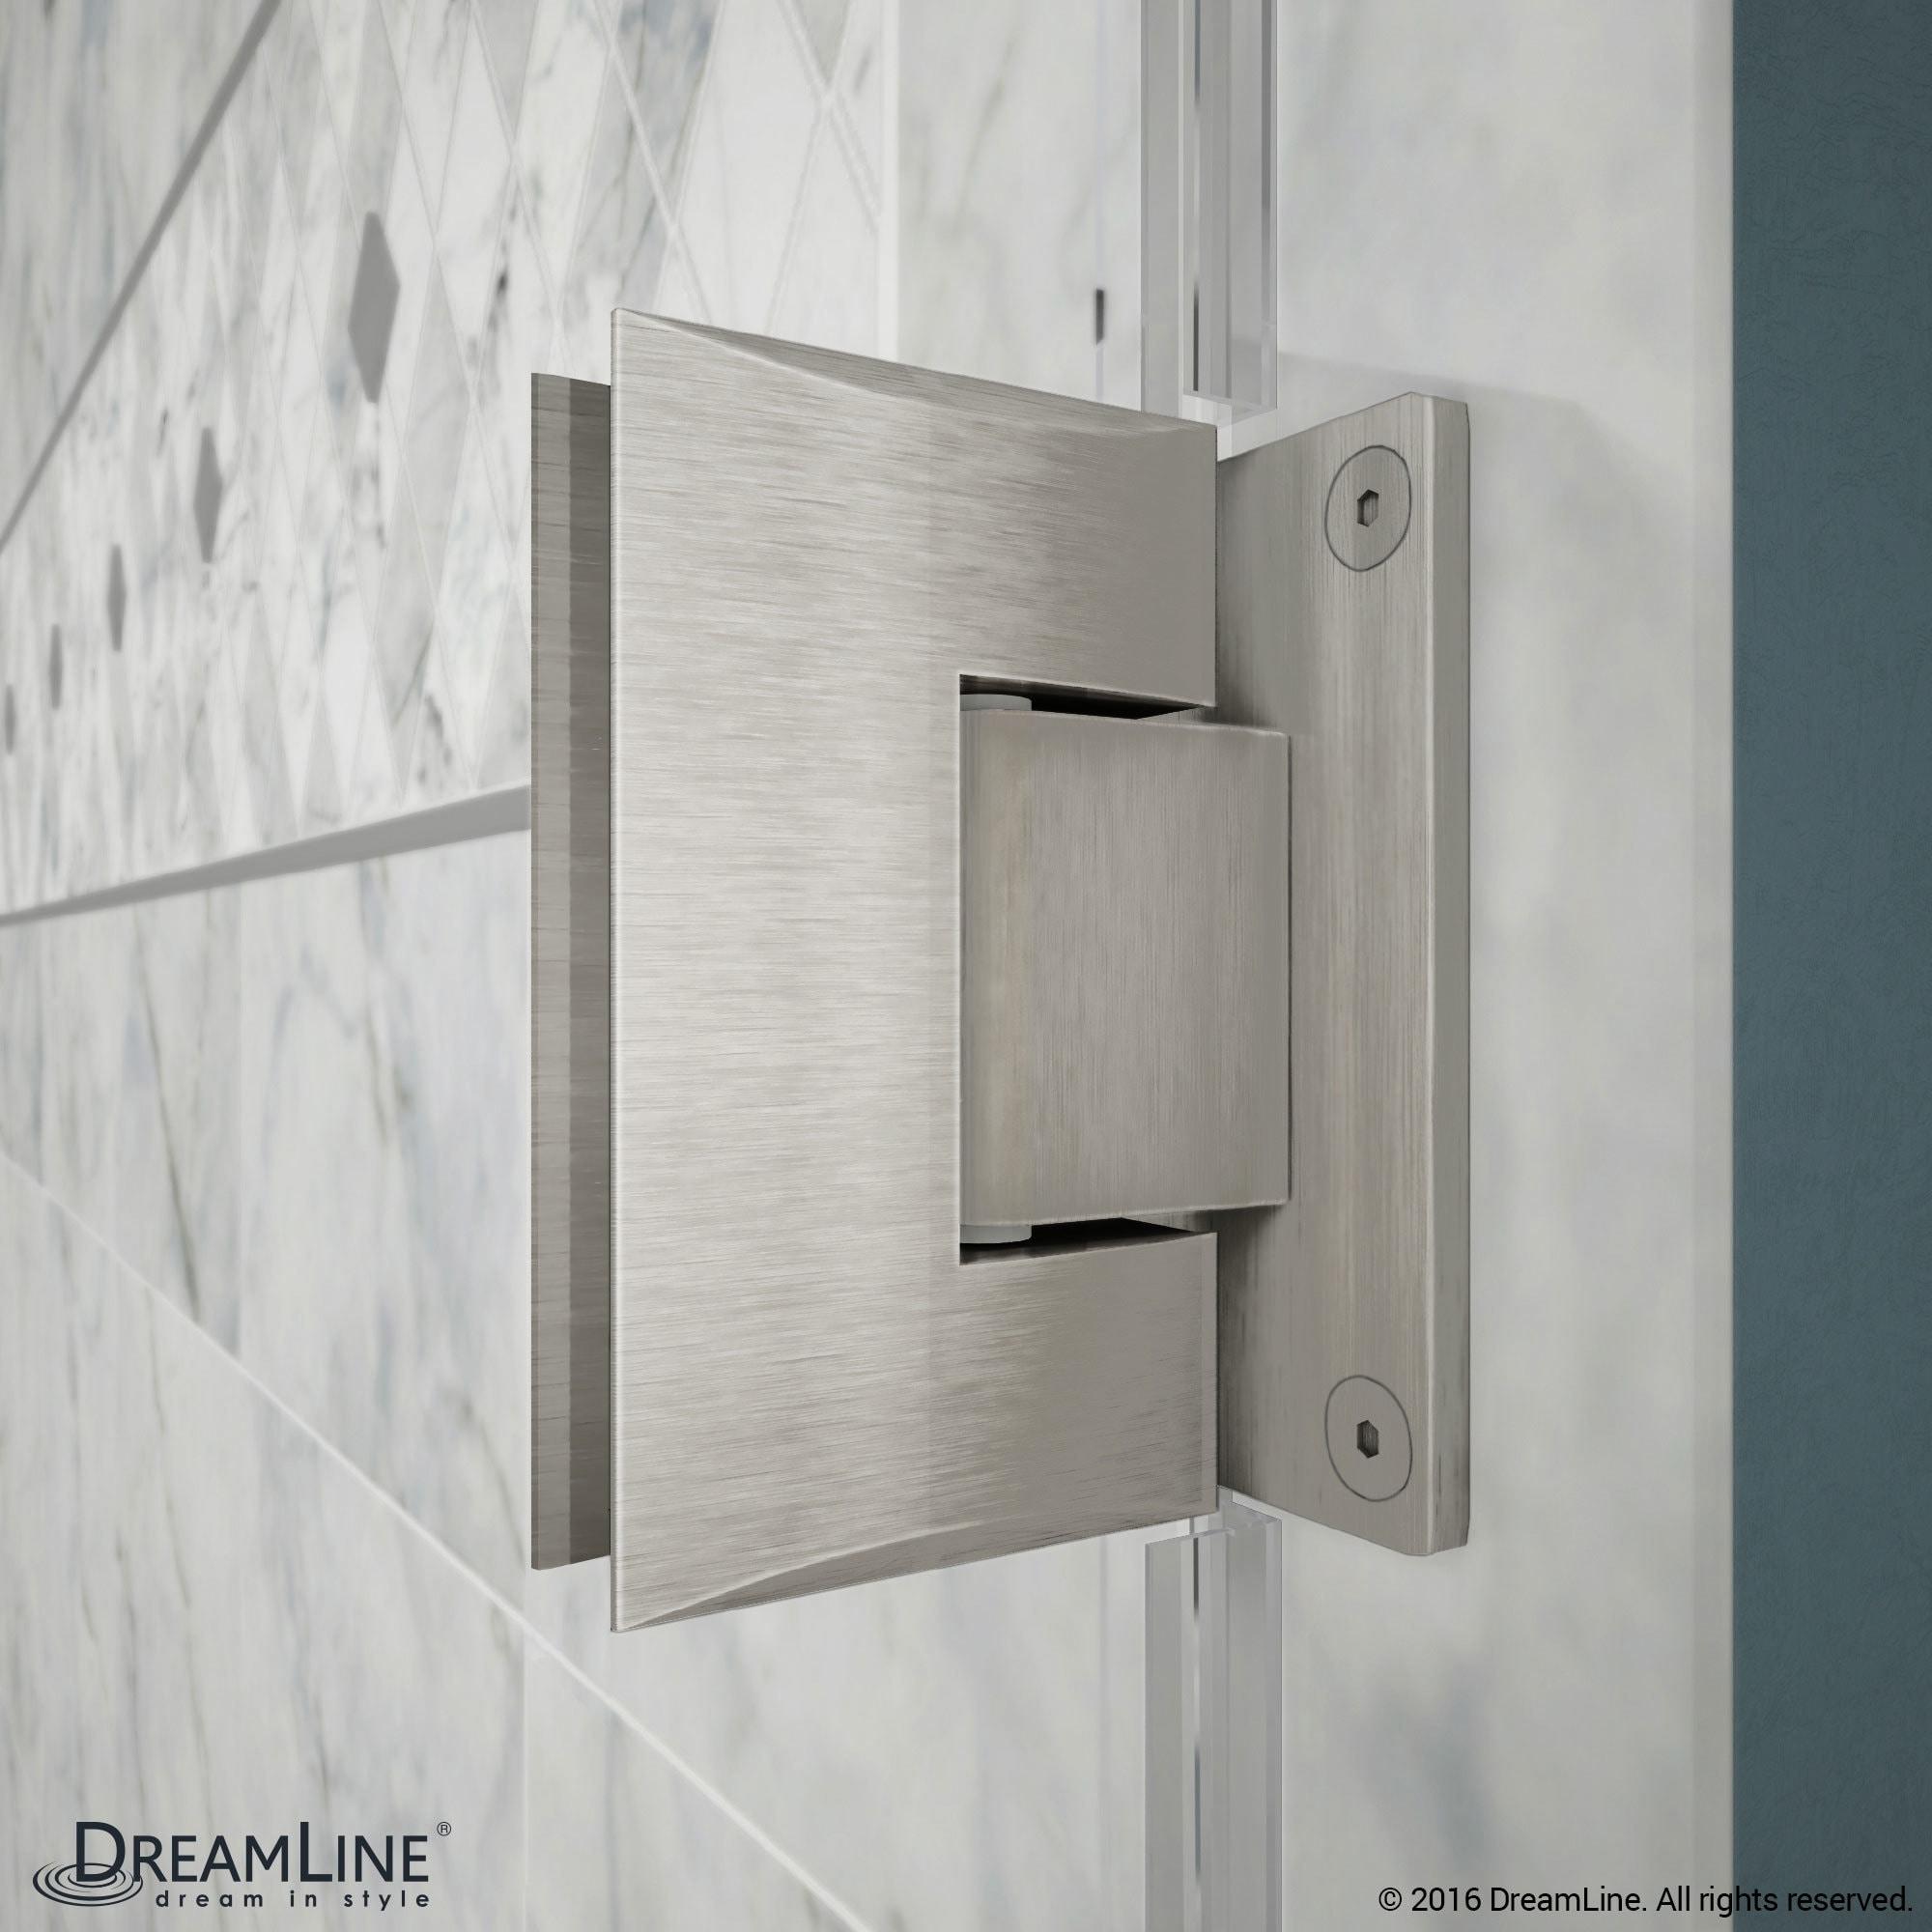 Shop Dreamline Unidoorlux Frameless Shower Door Free Shipping